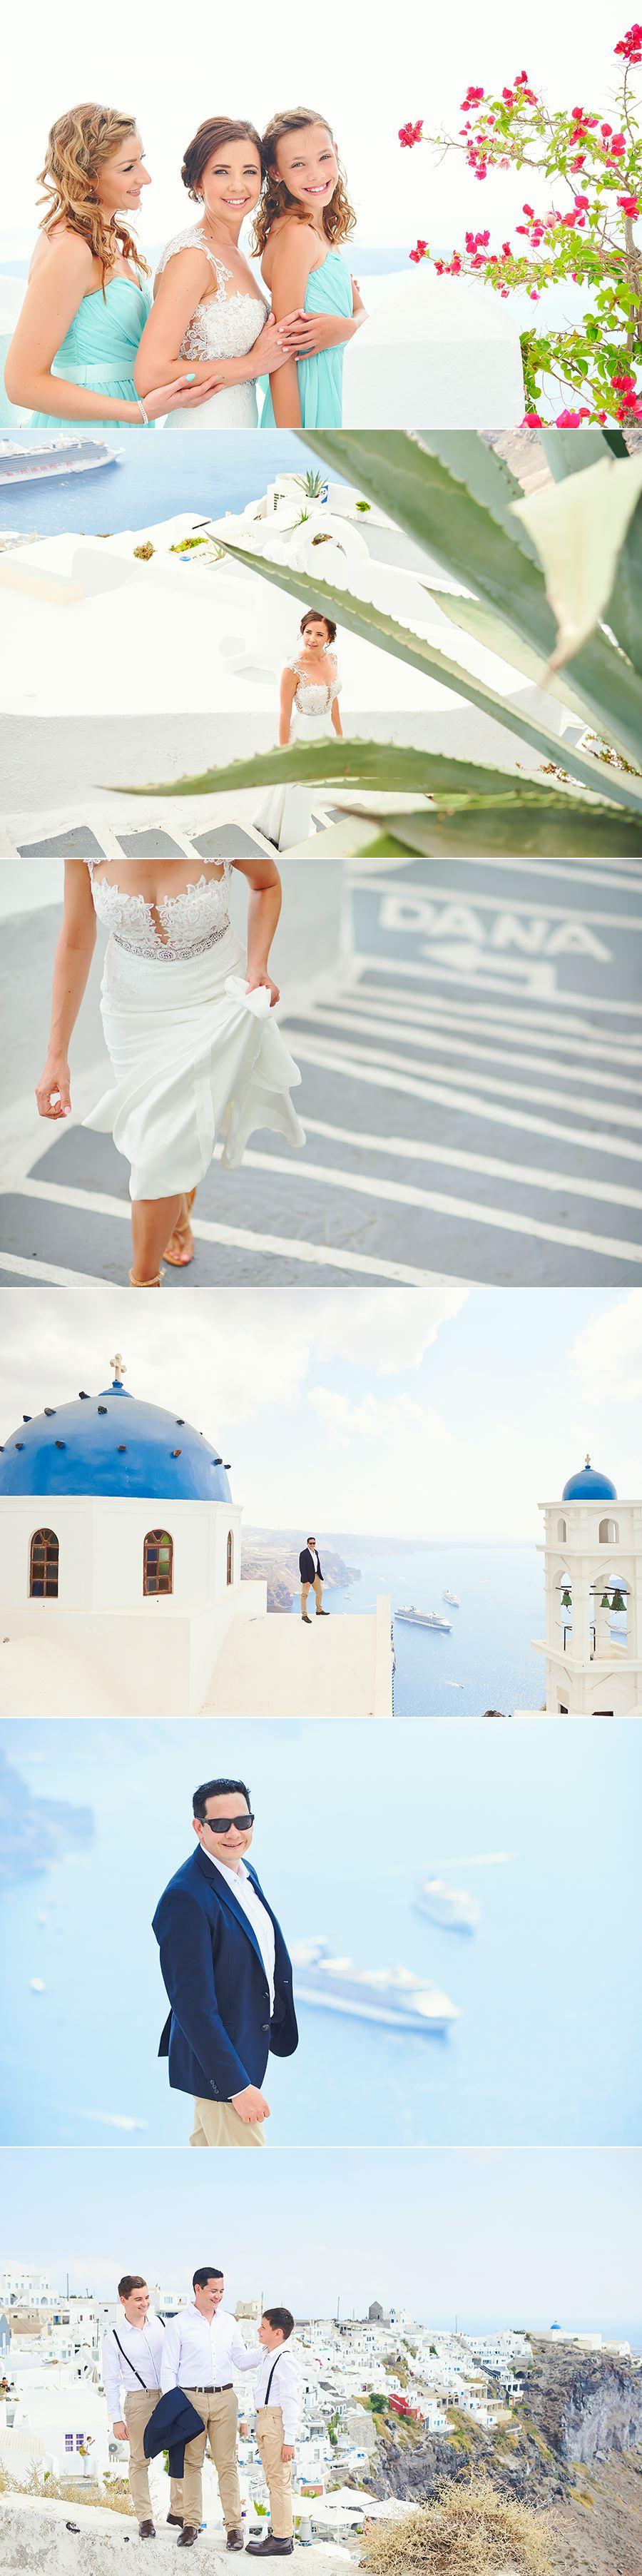 paul-simone-wedding-photos-03